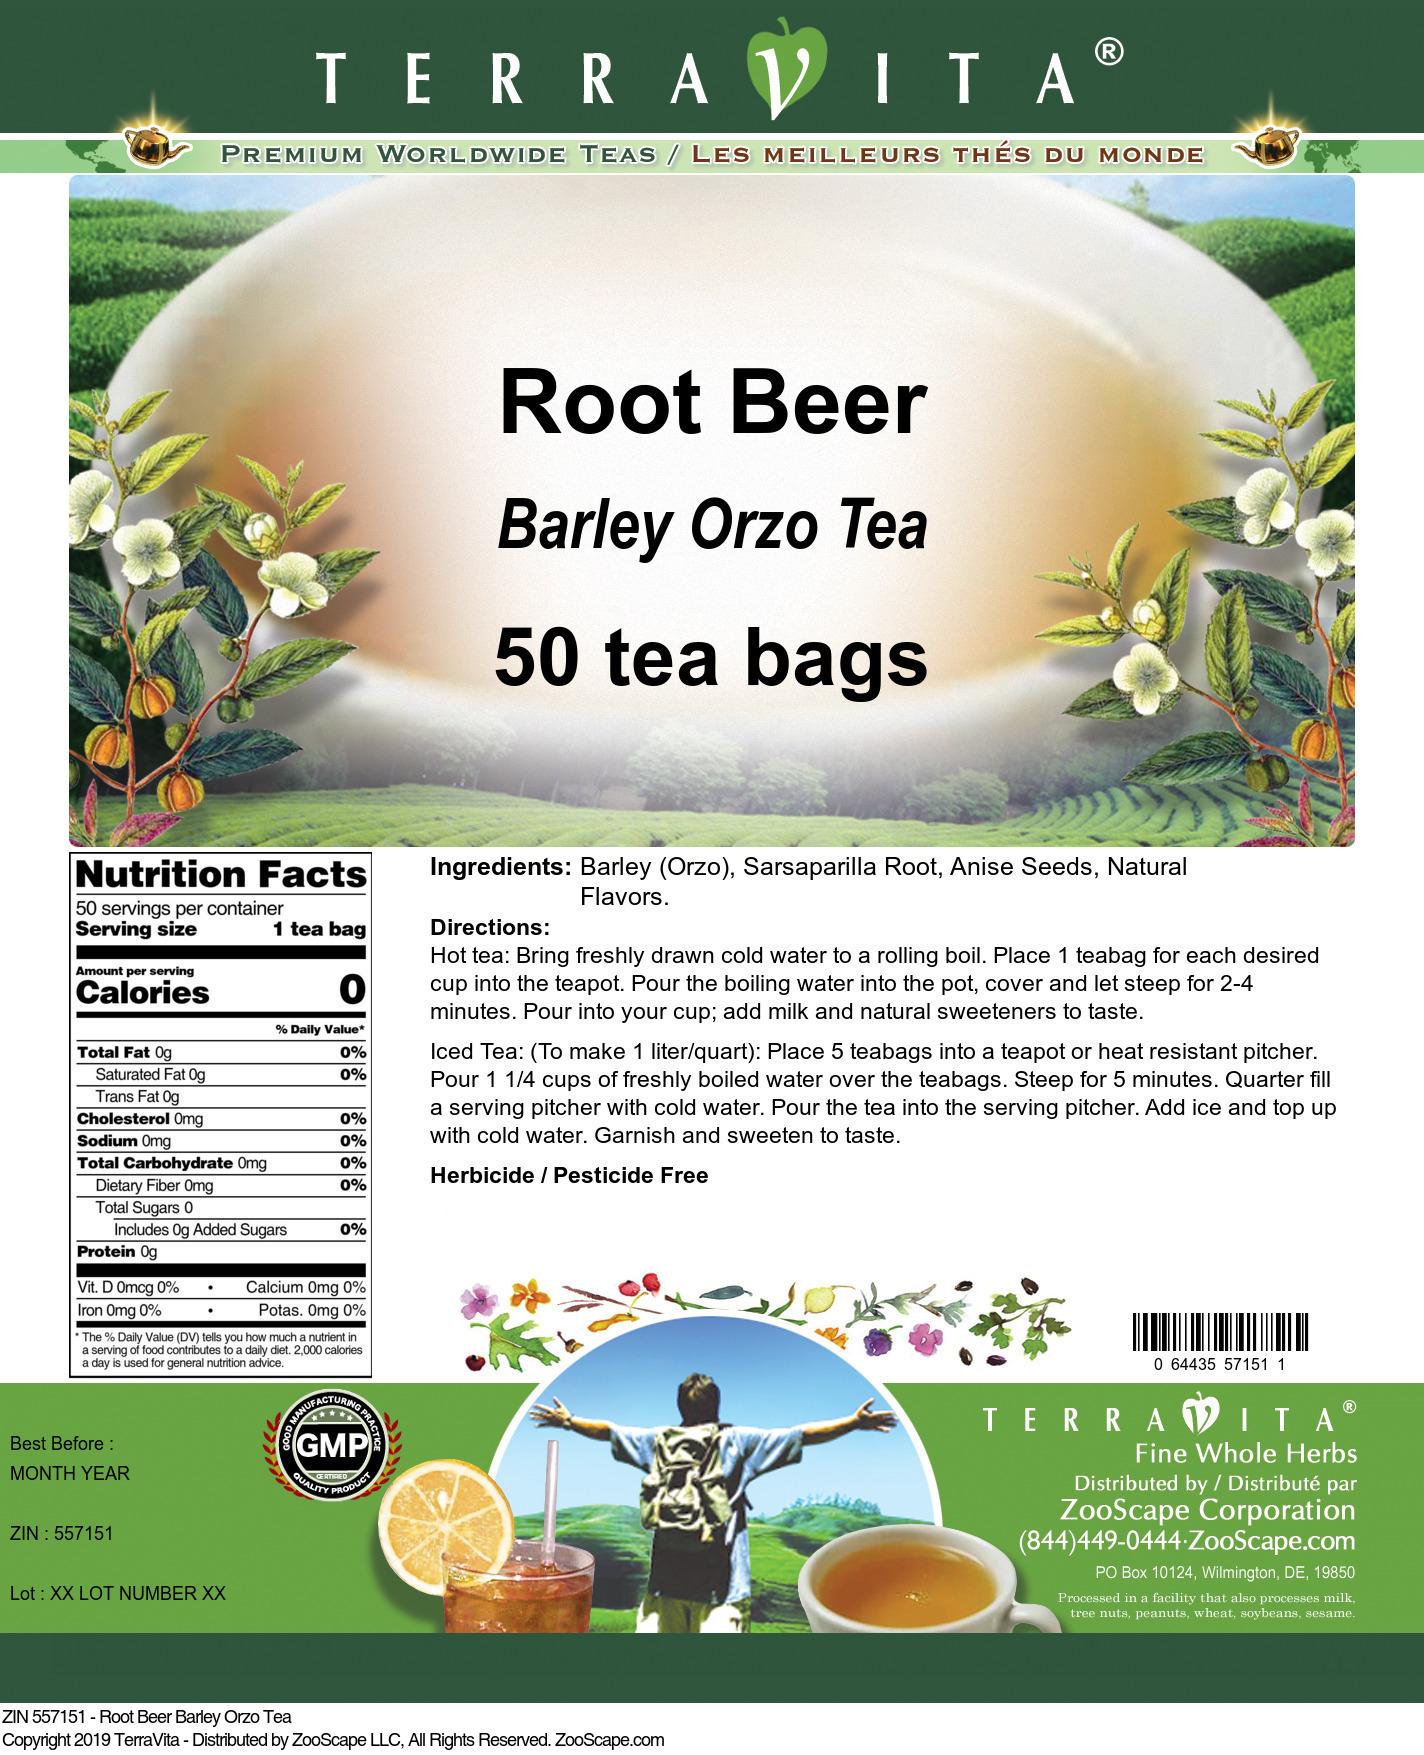 Root Beer Barley Orzo